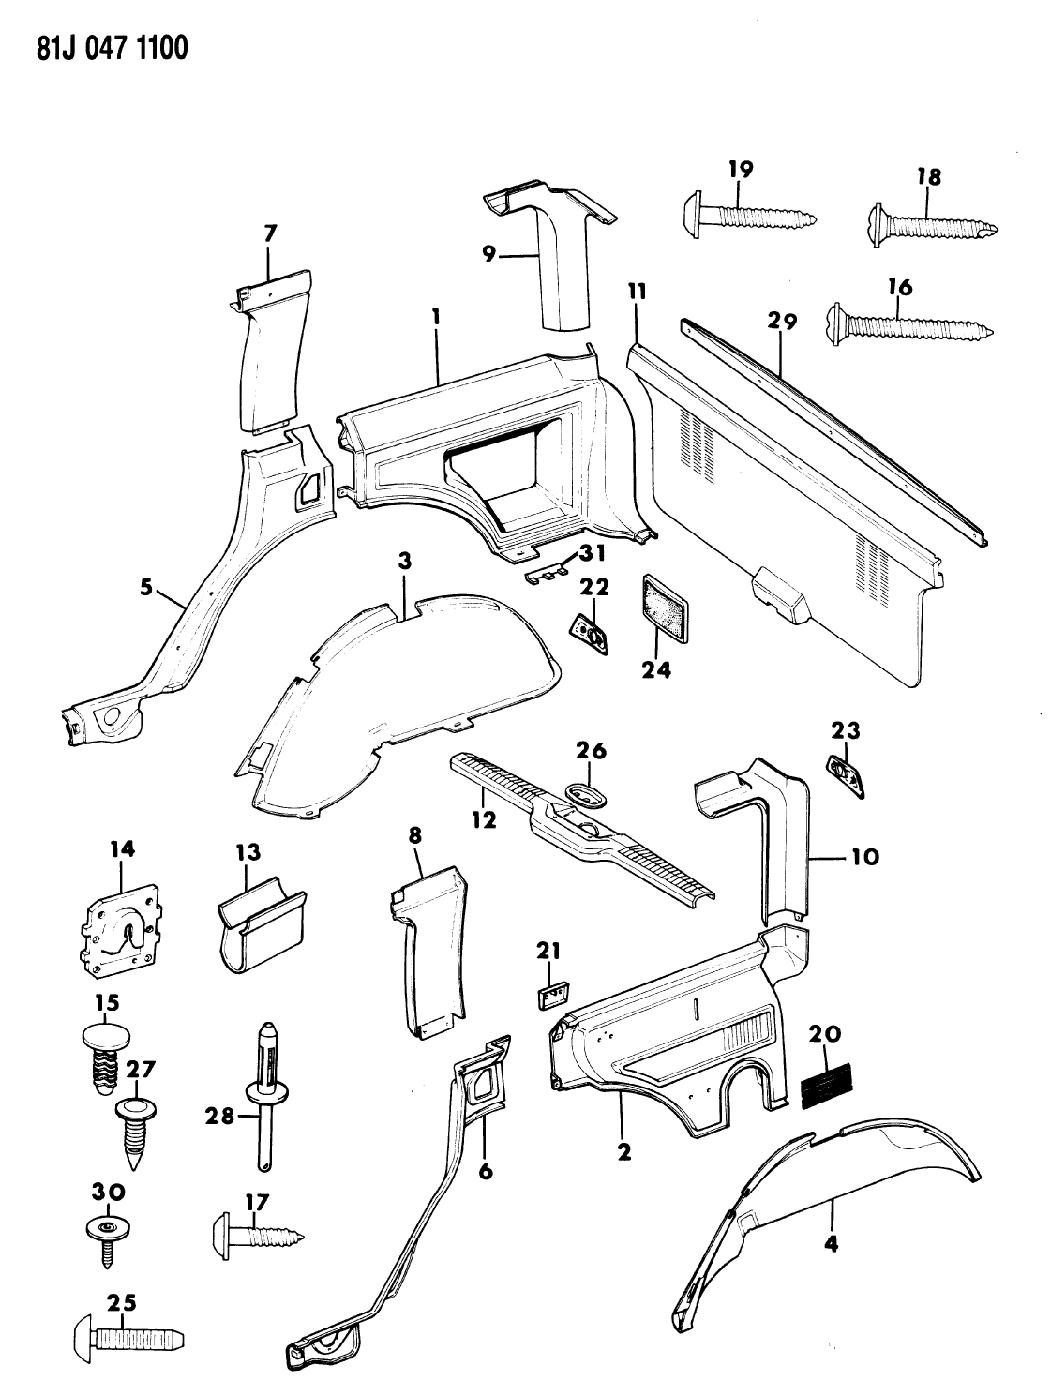 1985 Jeep Cherokee Panels